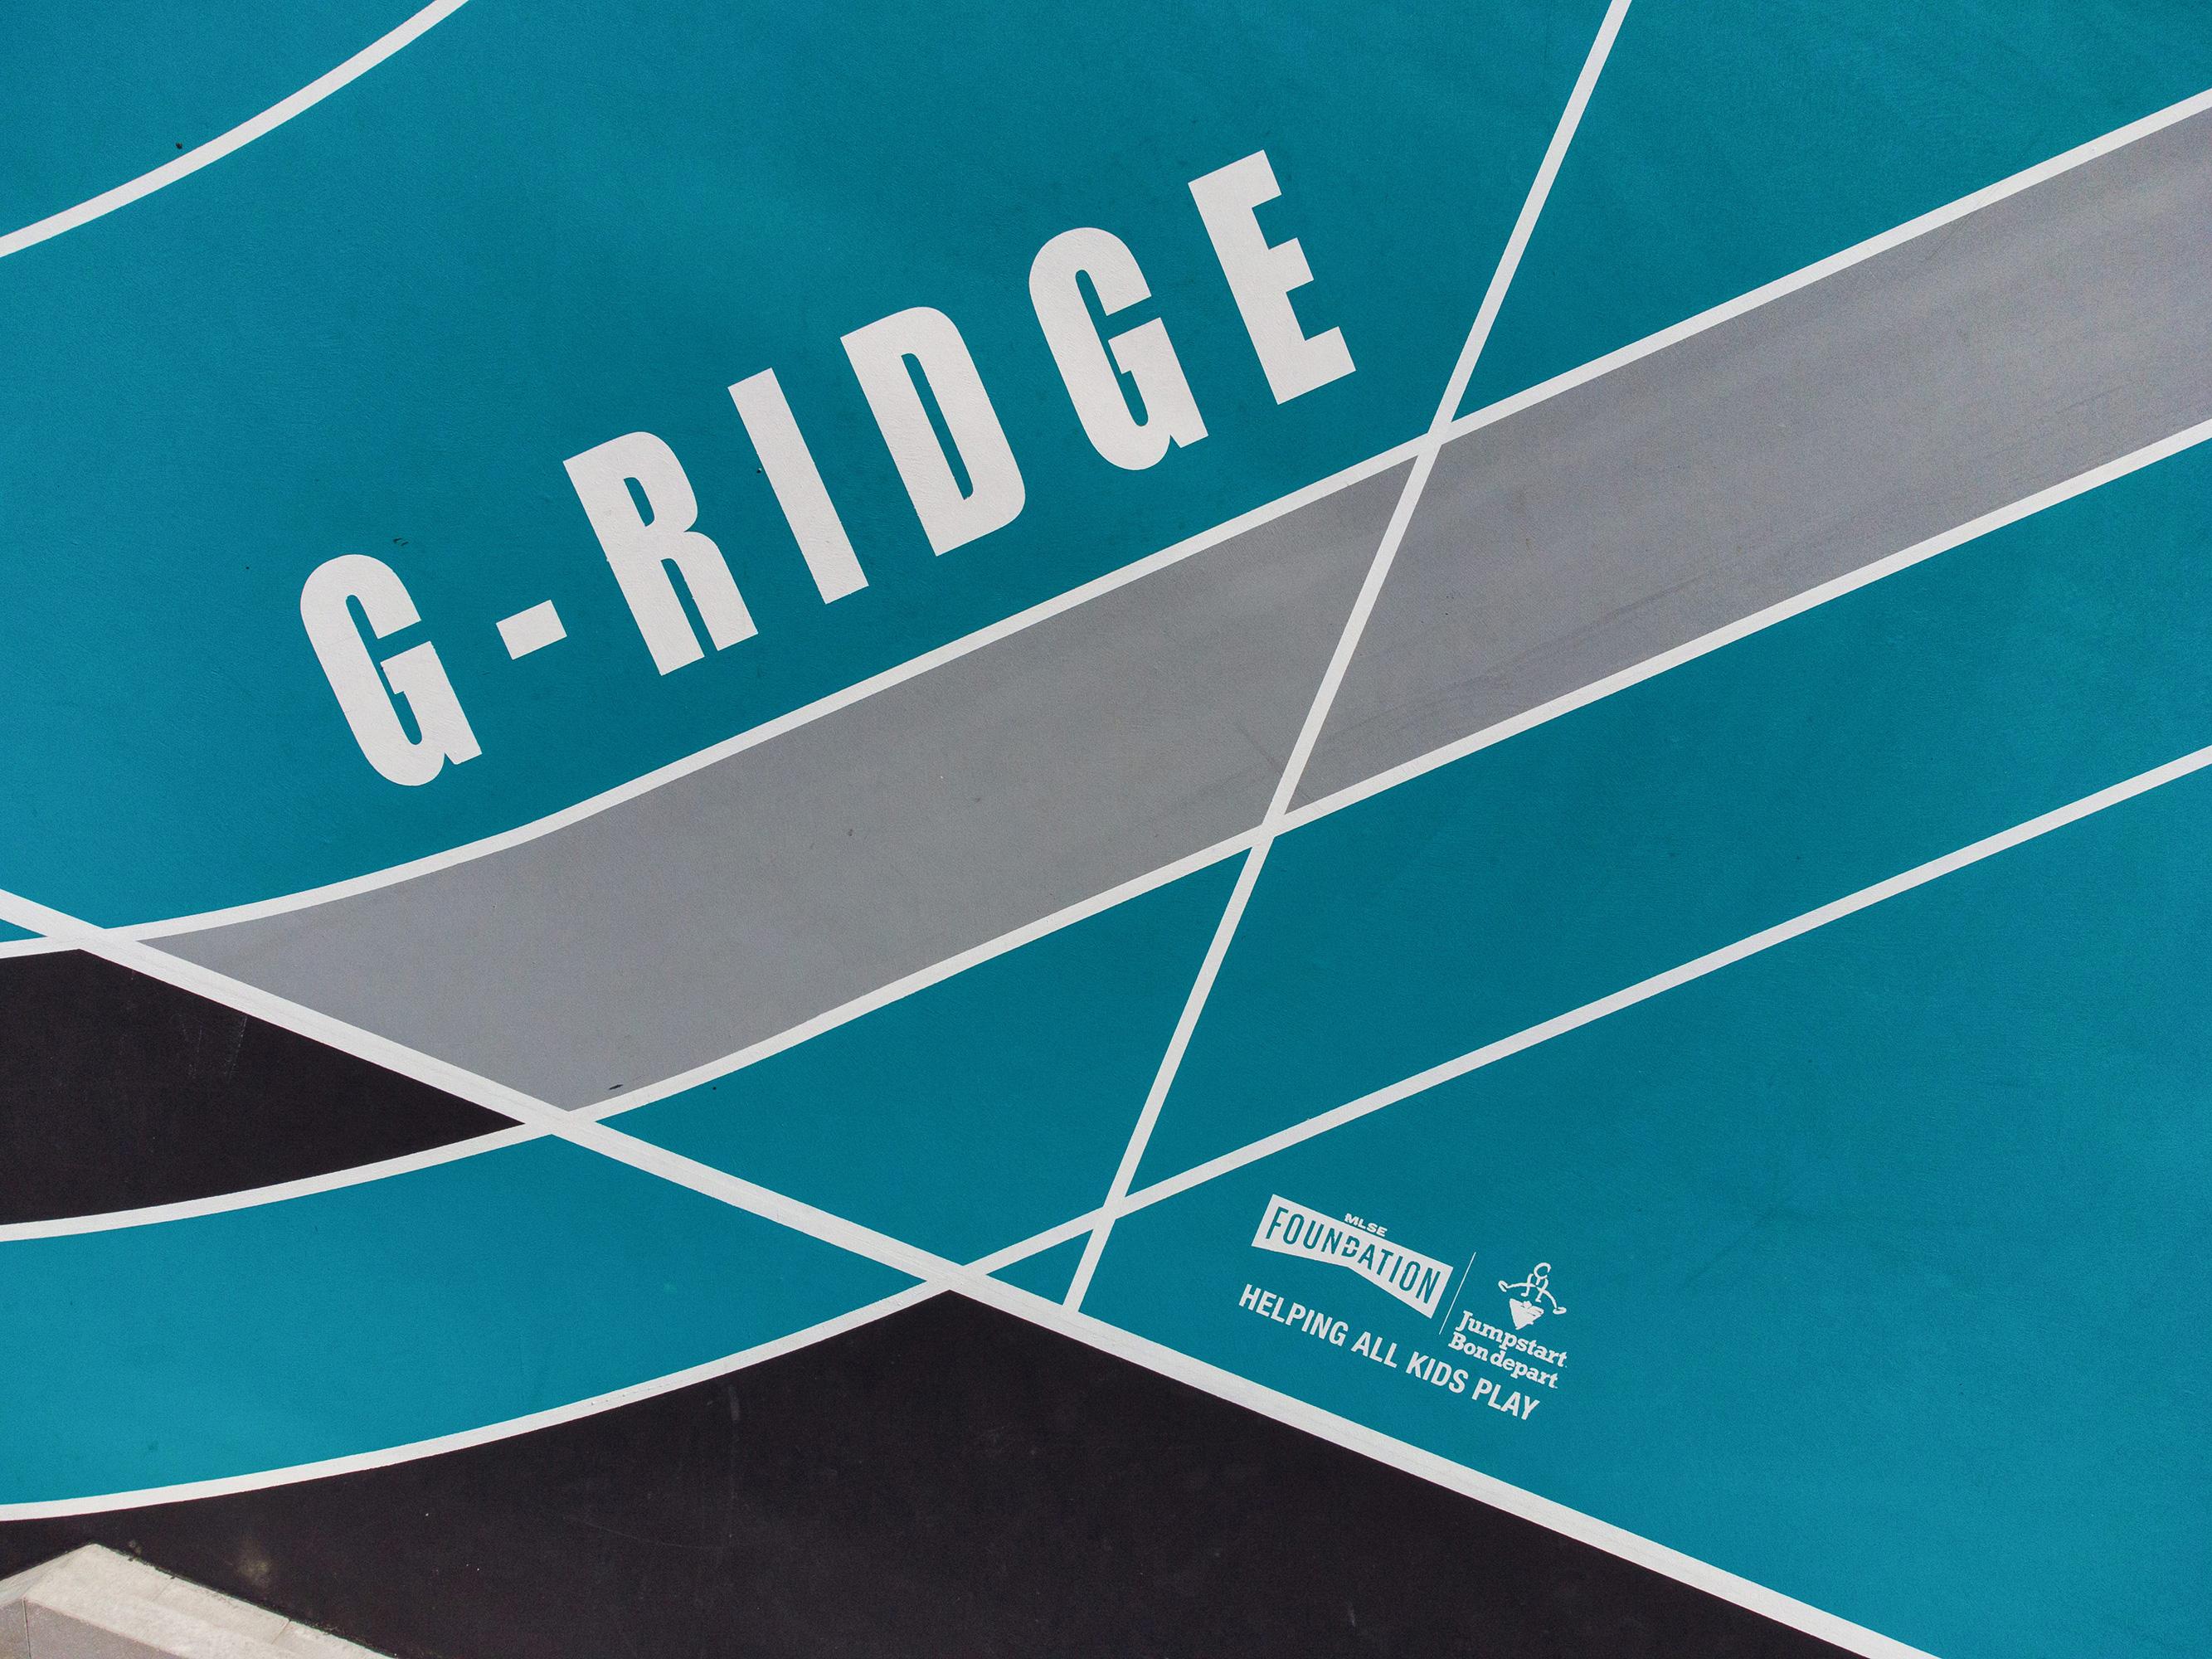 G Ridge Image